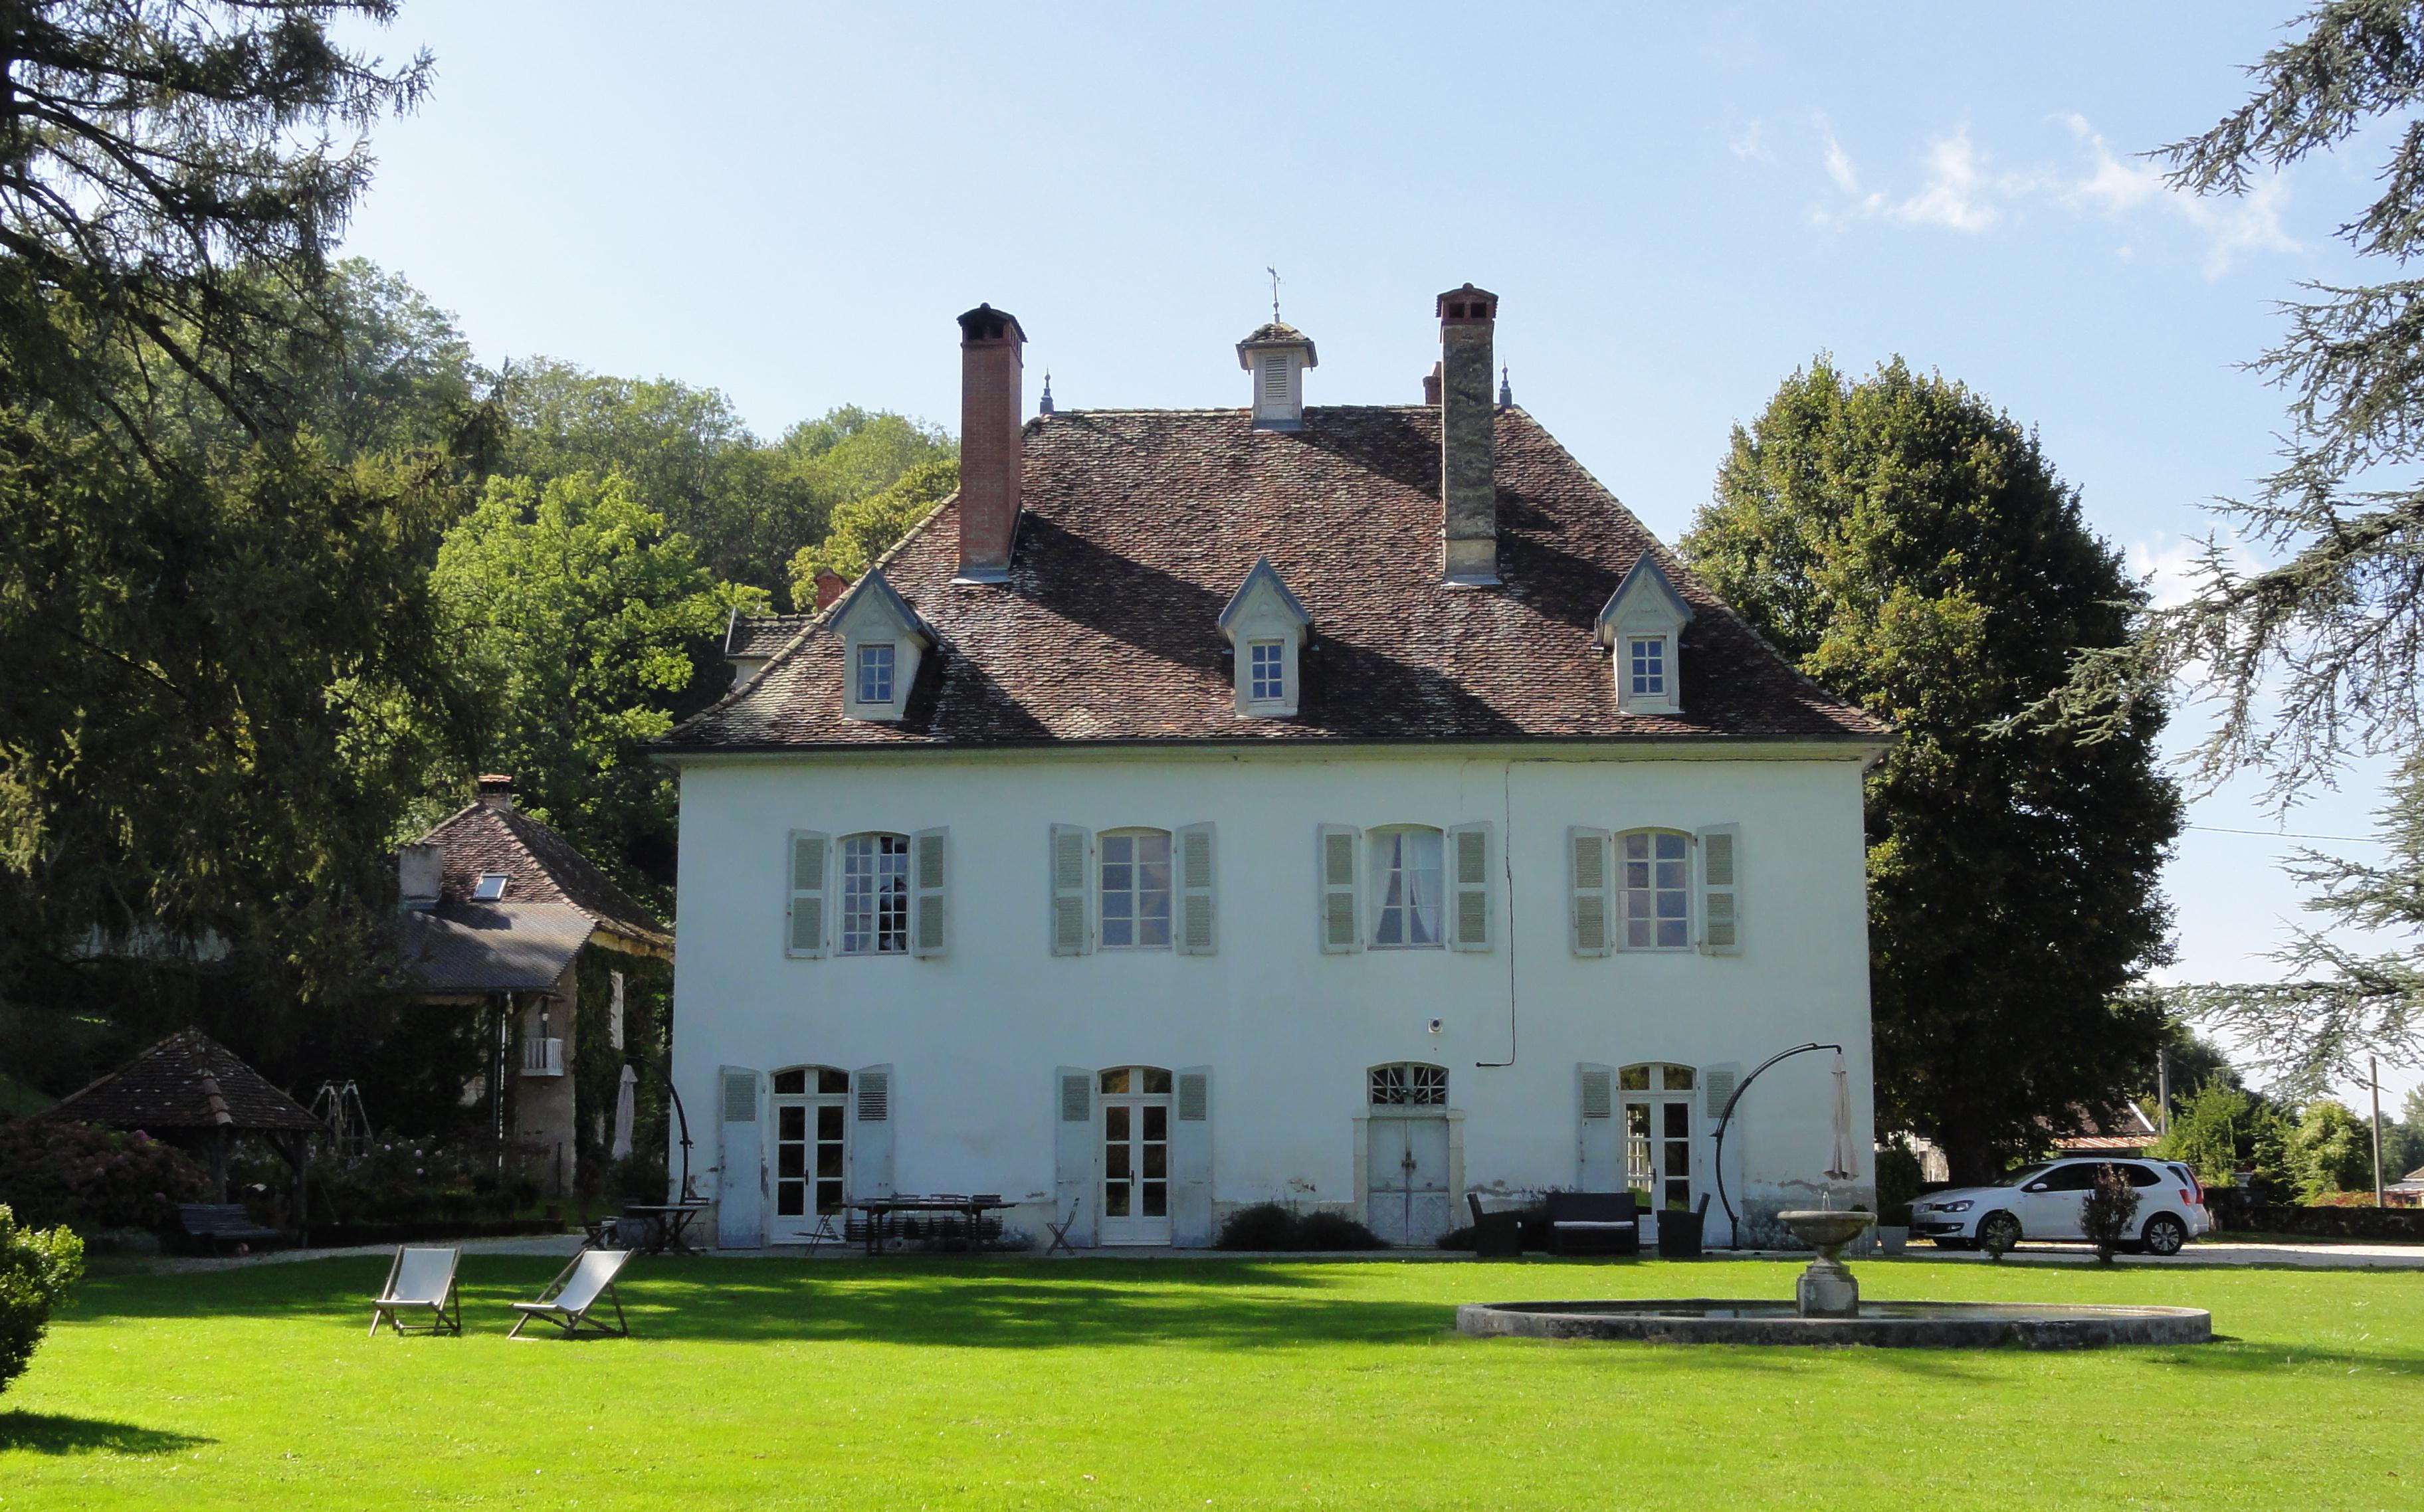 Casa para uma família para Venda às PONT DE BEAUVOISIN - BELLE DEMEURE SAINT JEAN D'AVELANNE Other Rhone-Alpes, Rhone-Alpes 38480 França